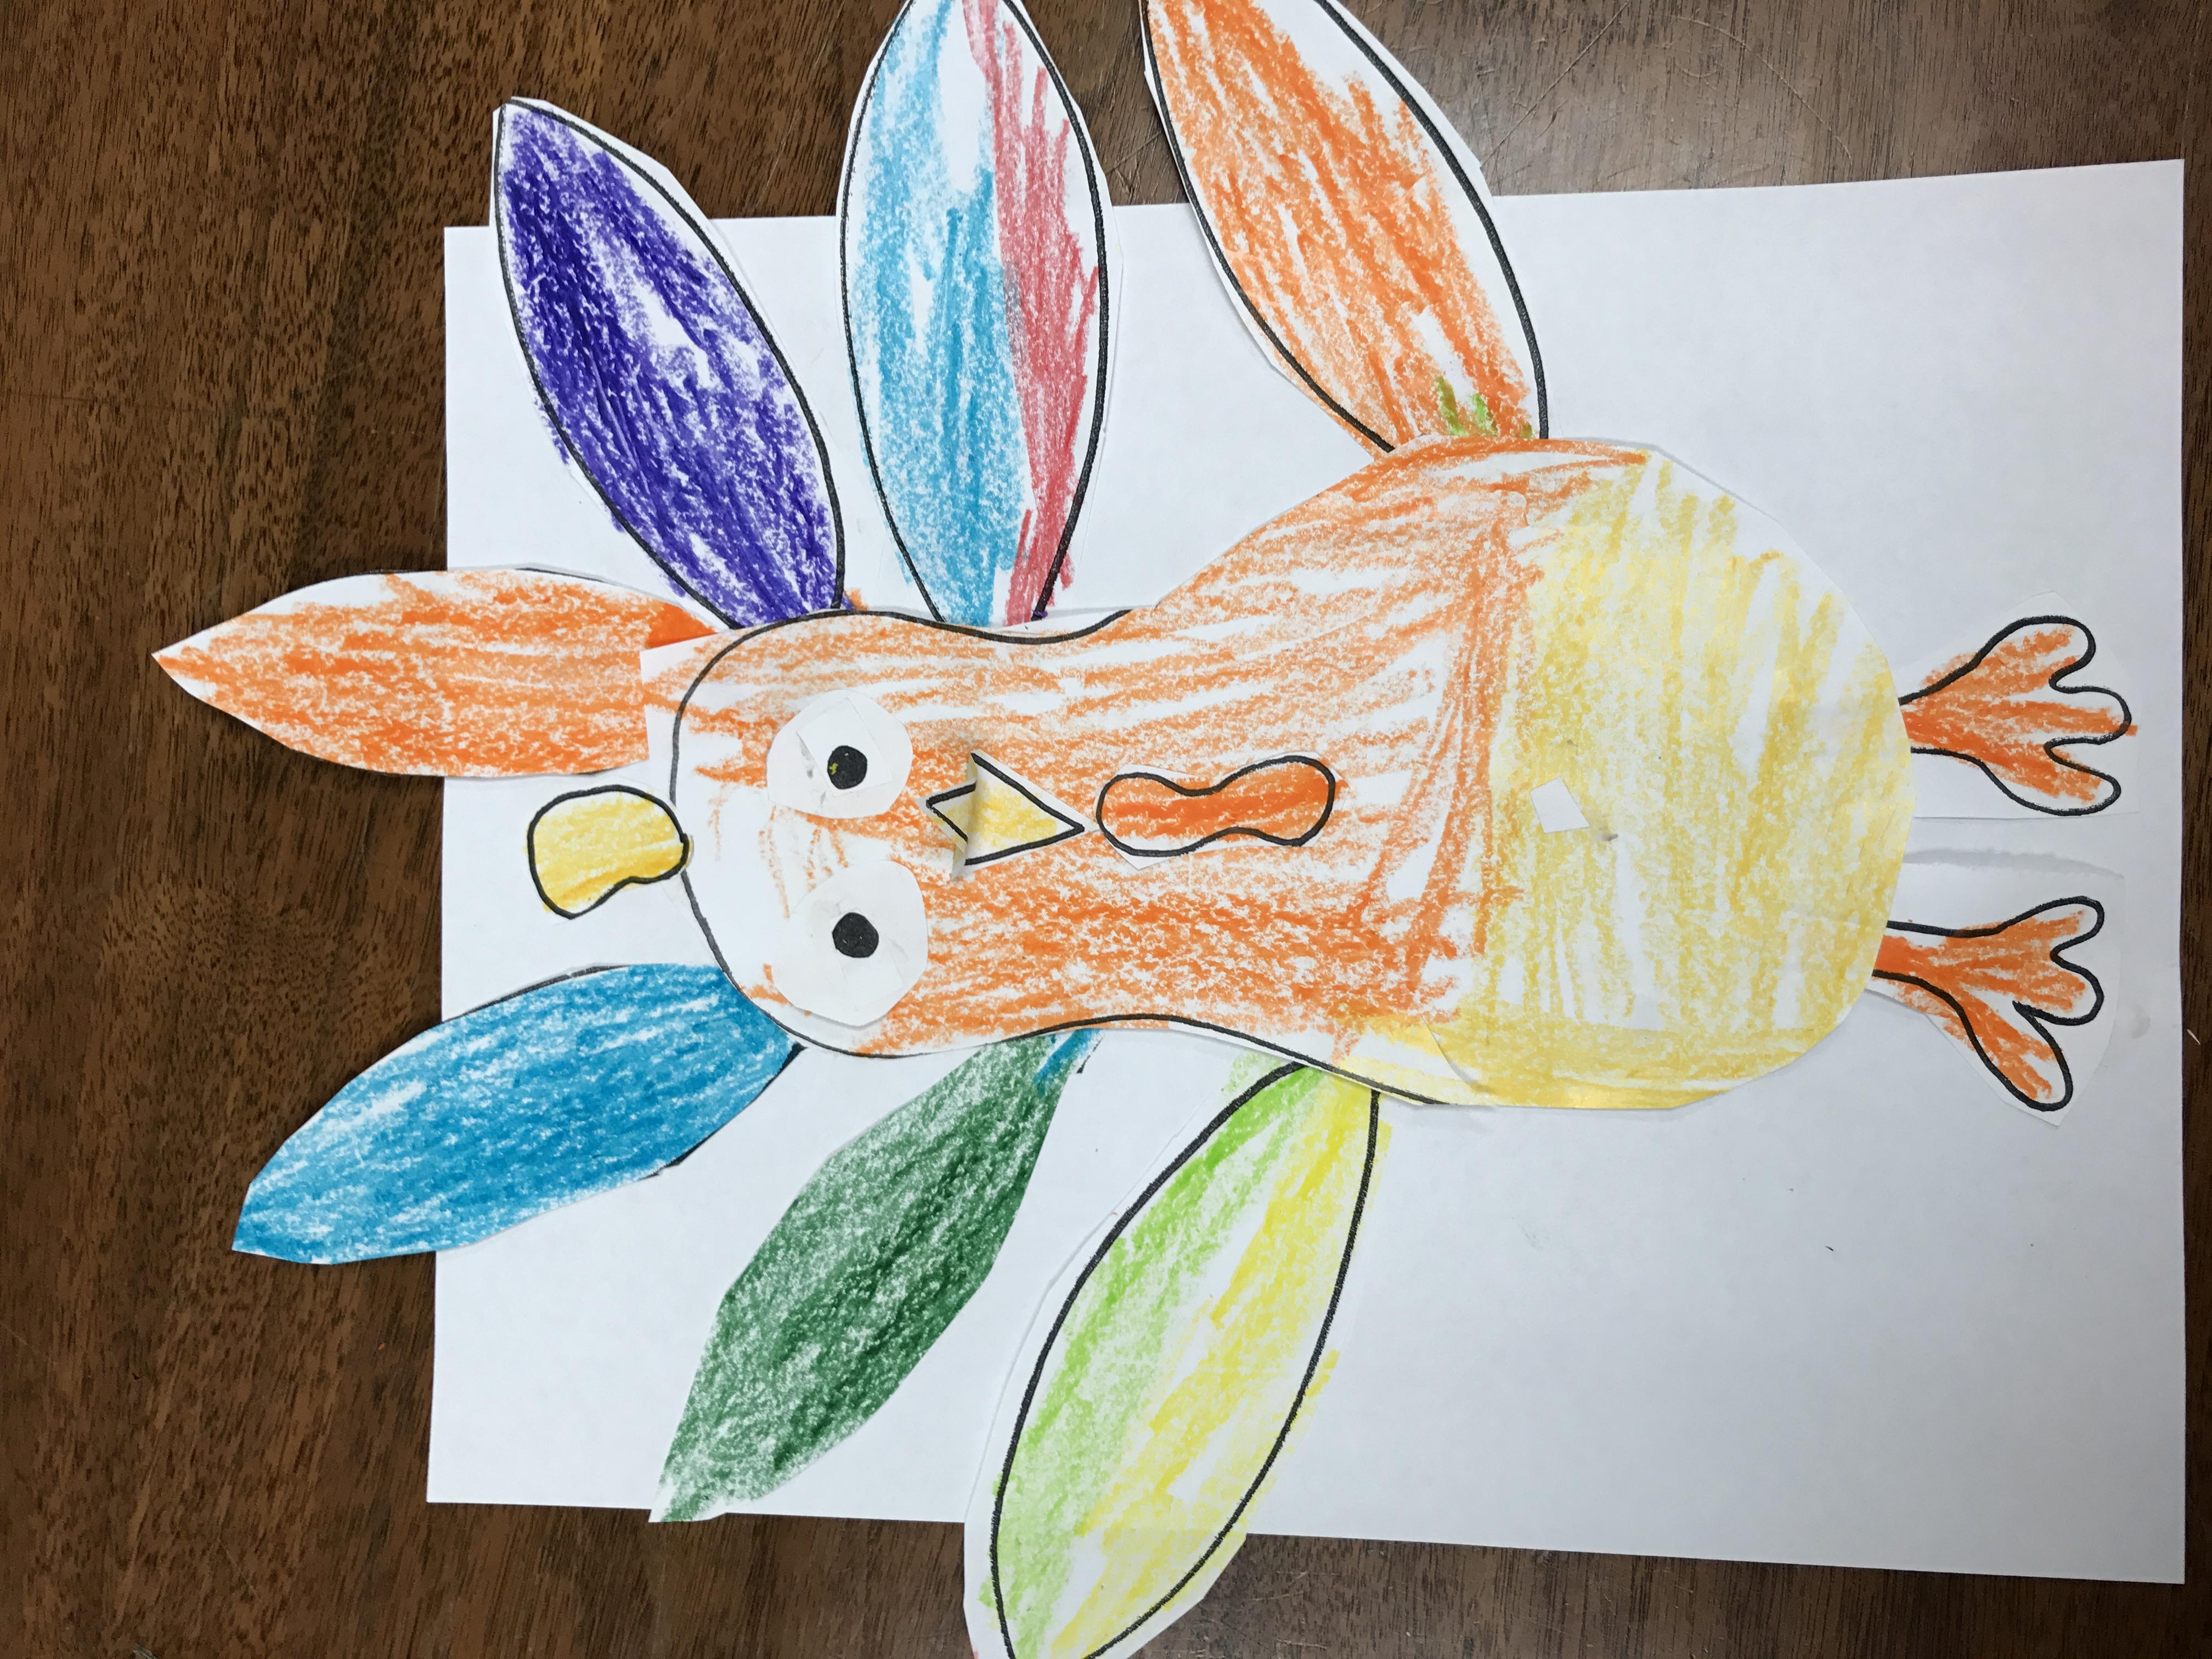 Complete paper turkey